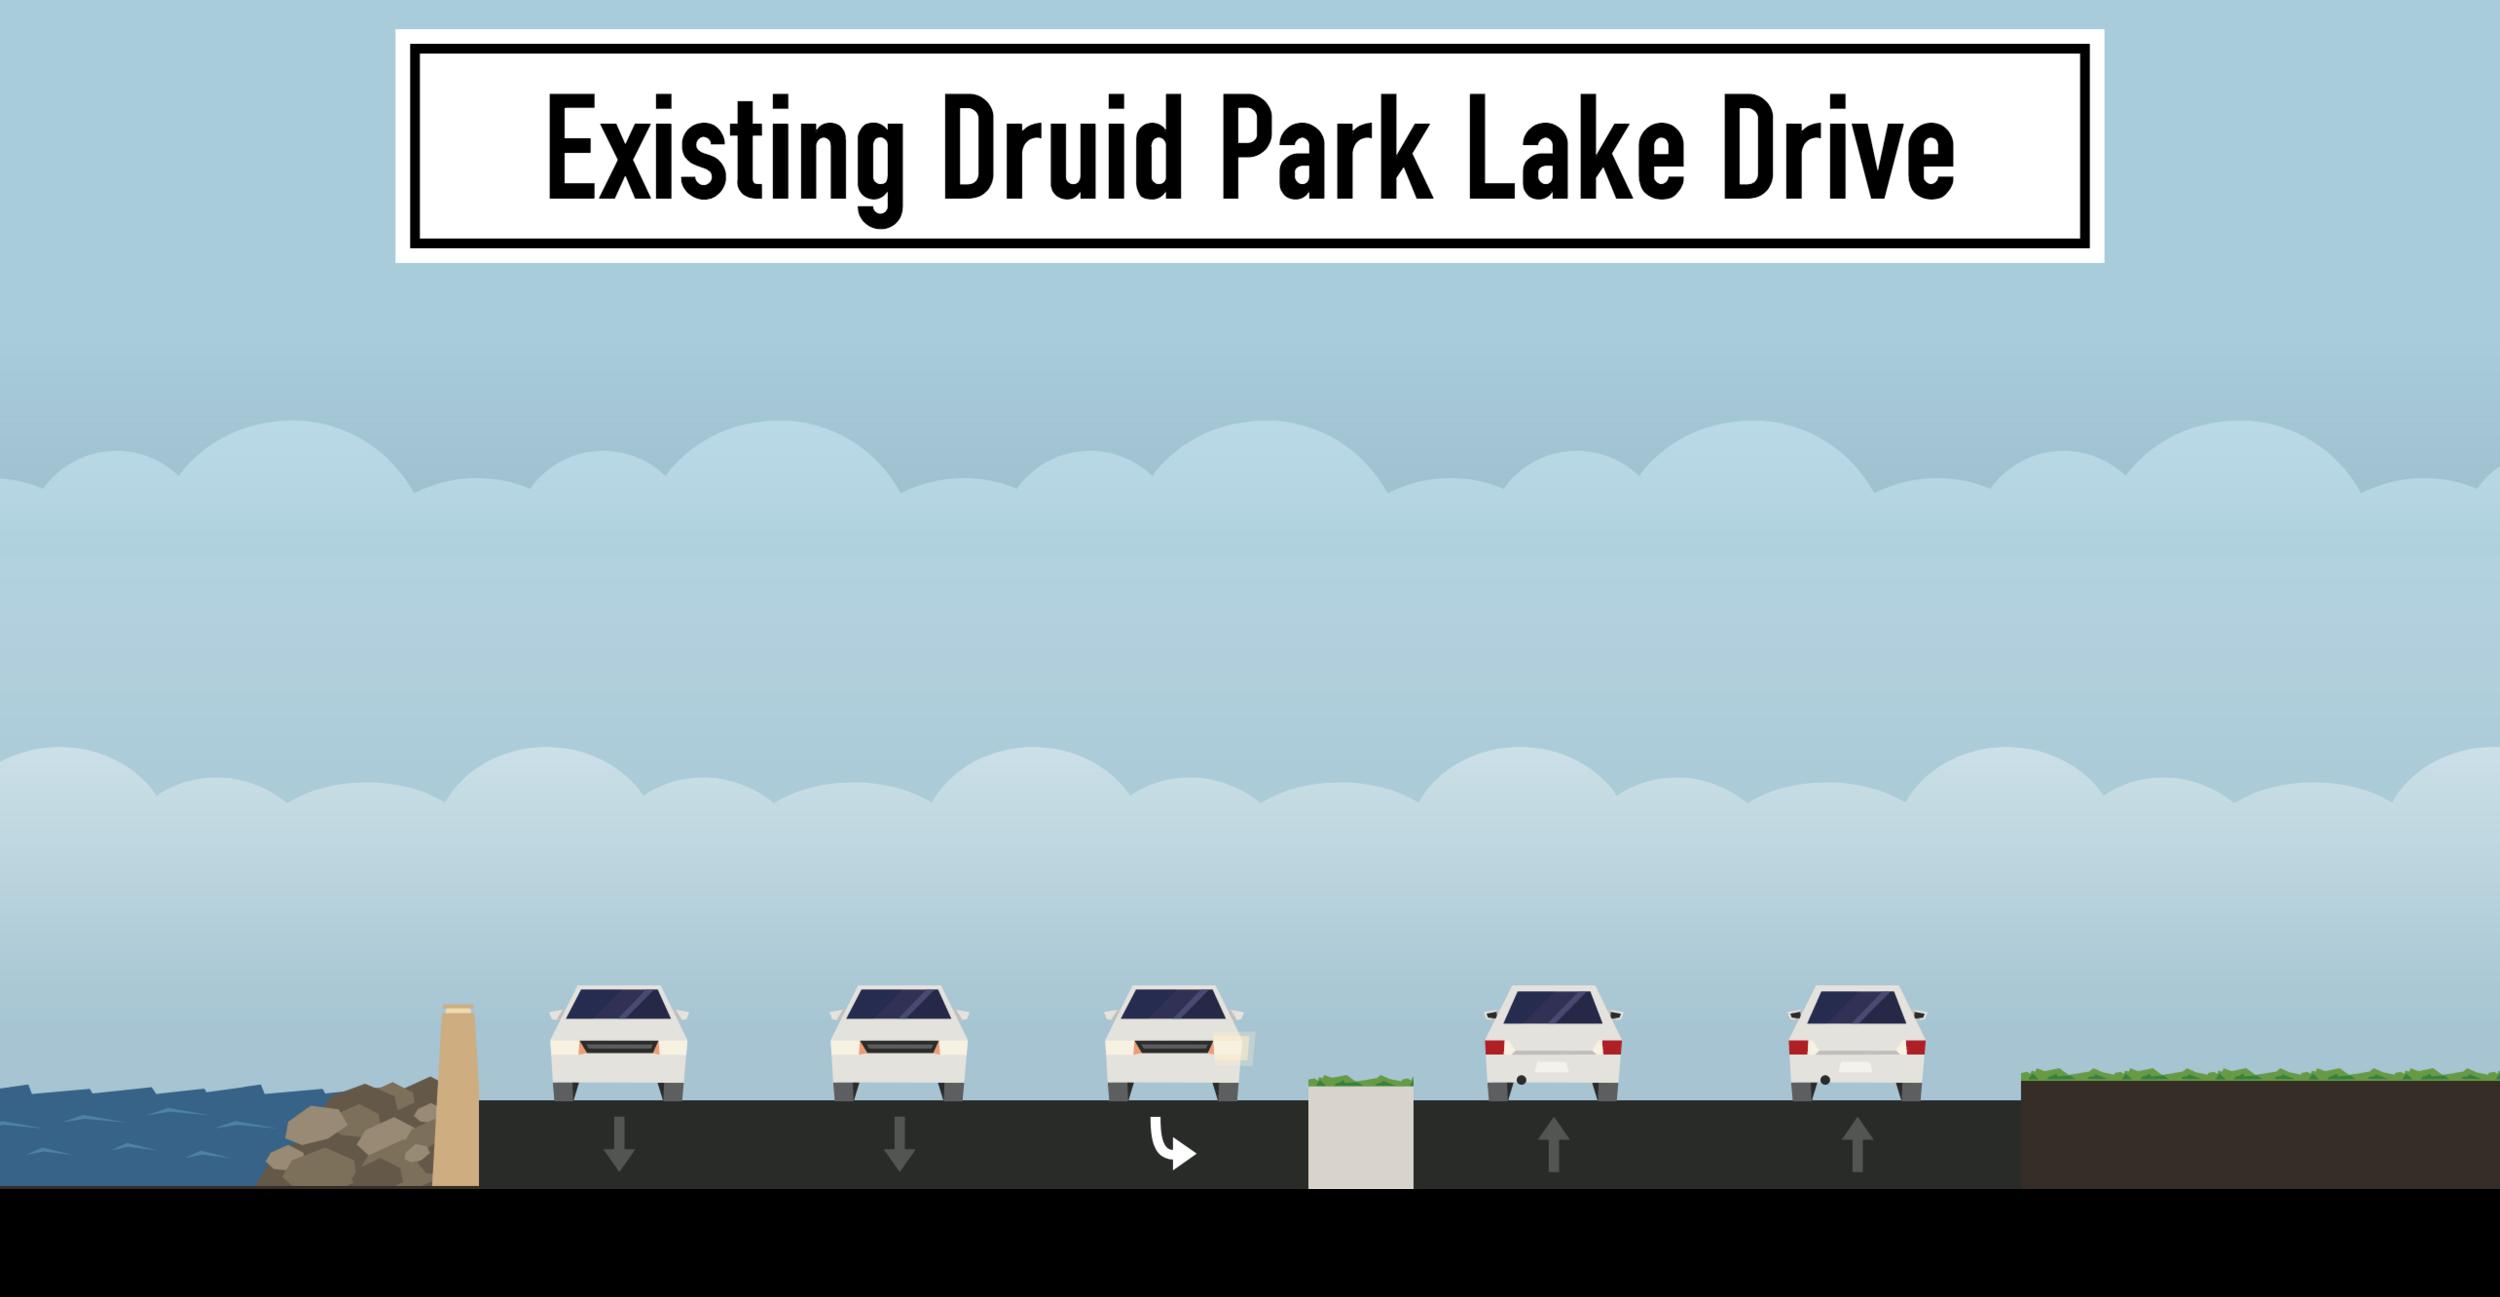 existing-druid-park-lake-drive.png